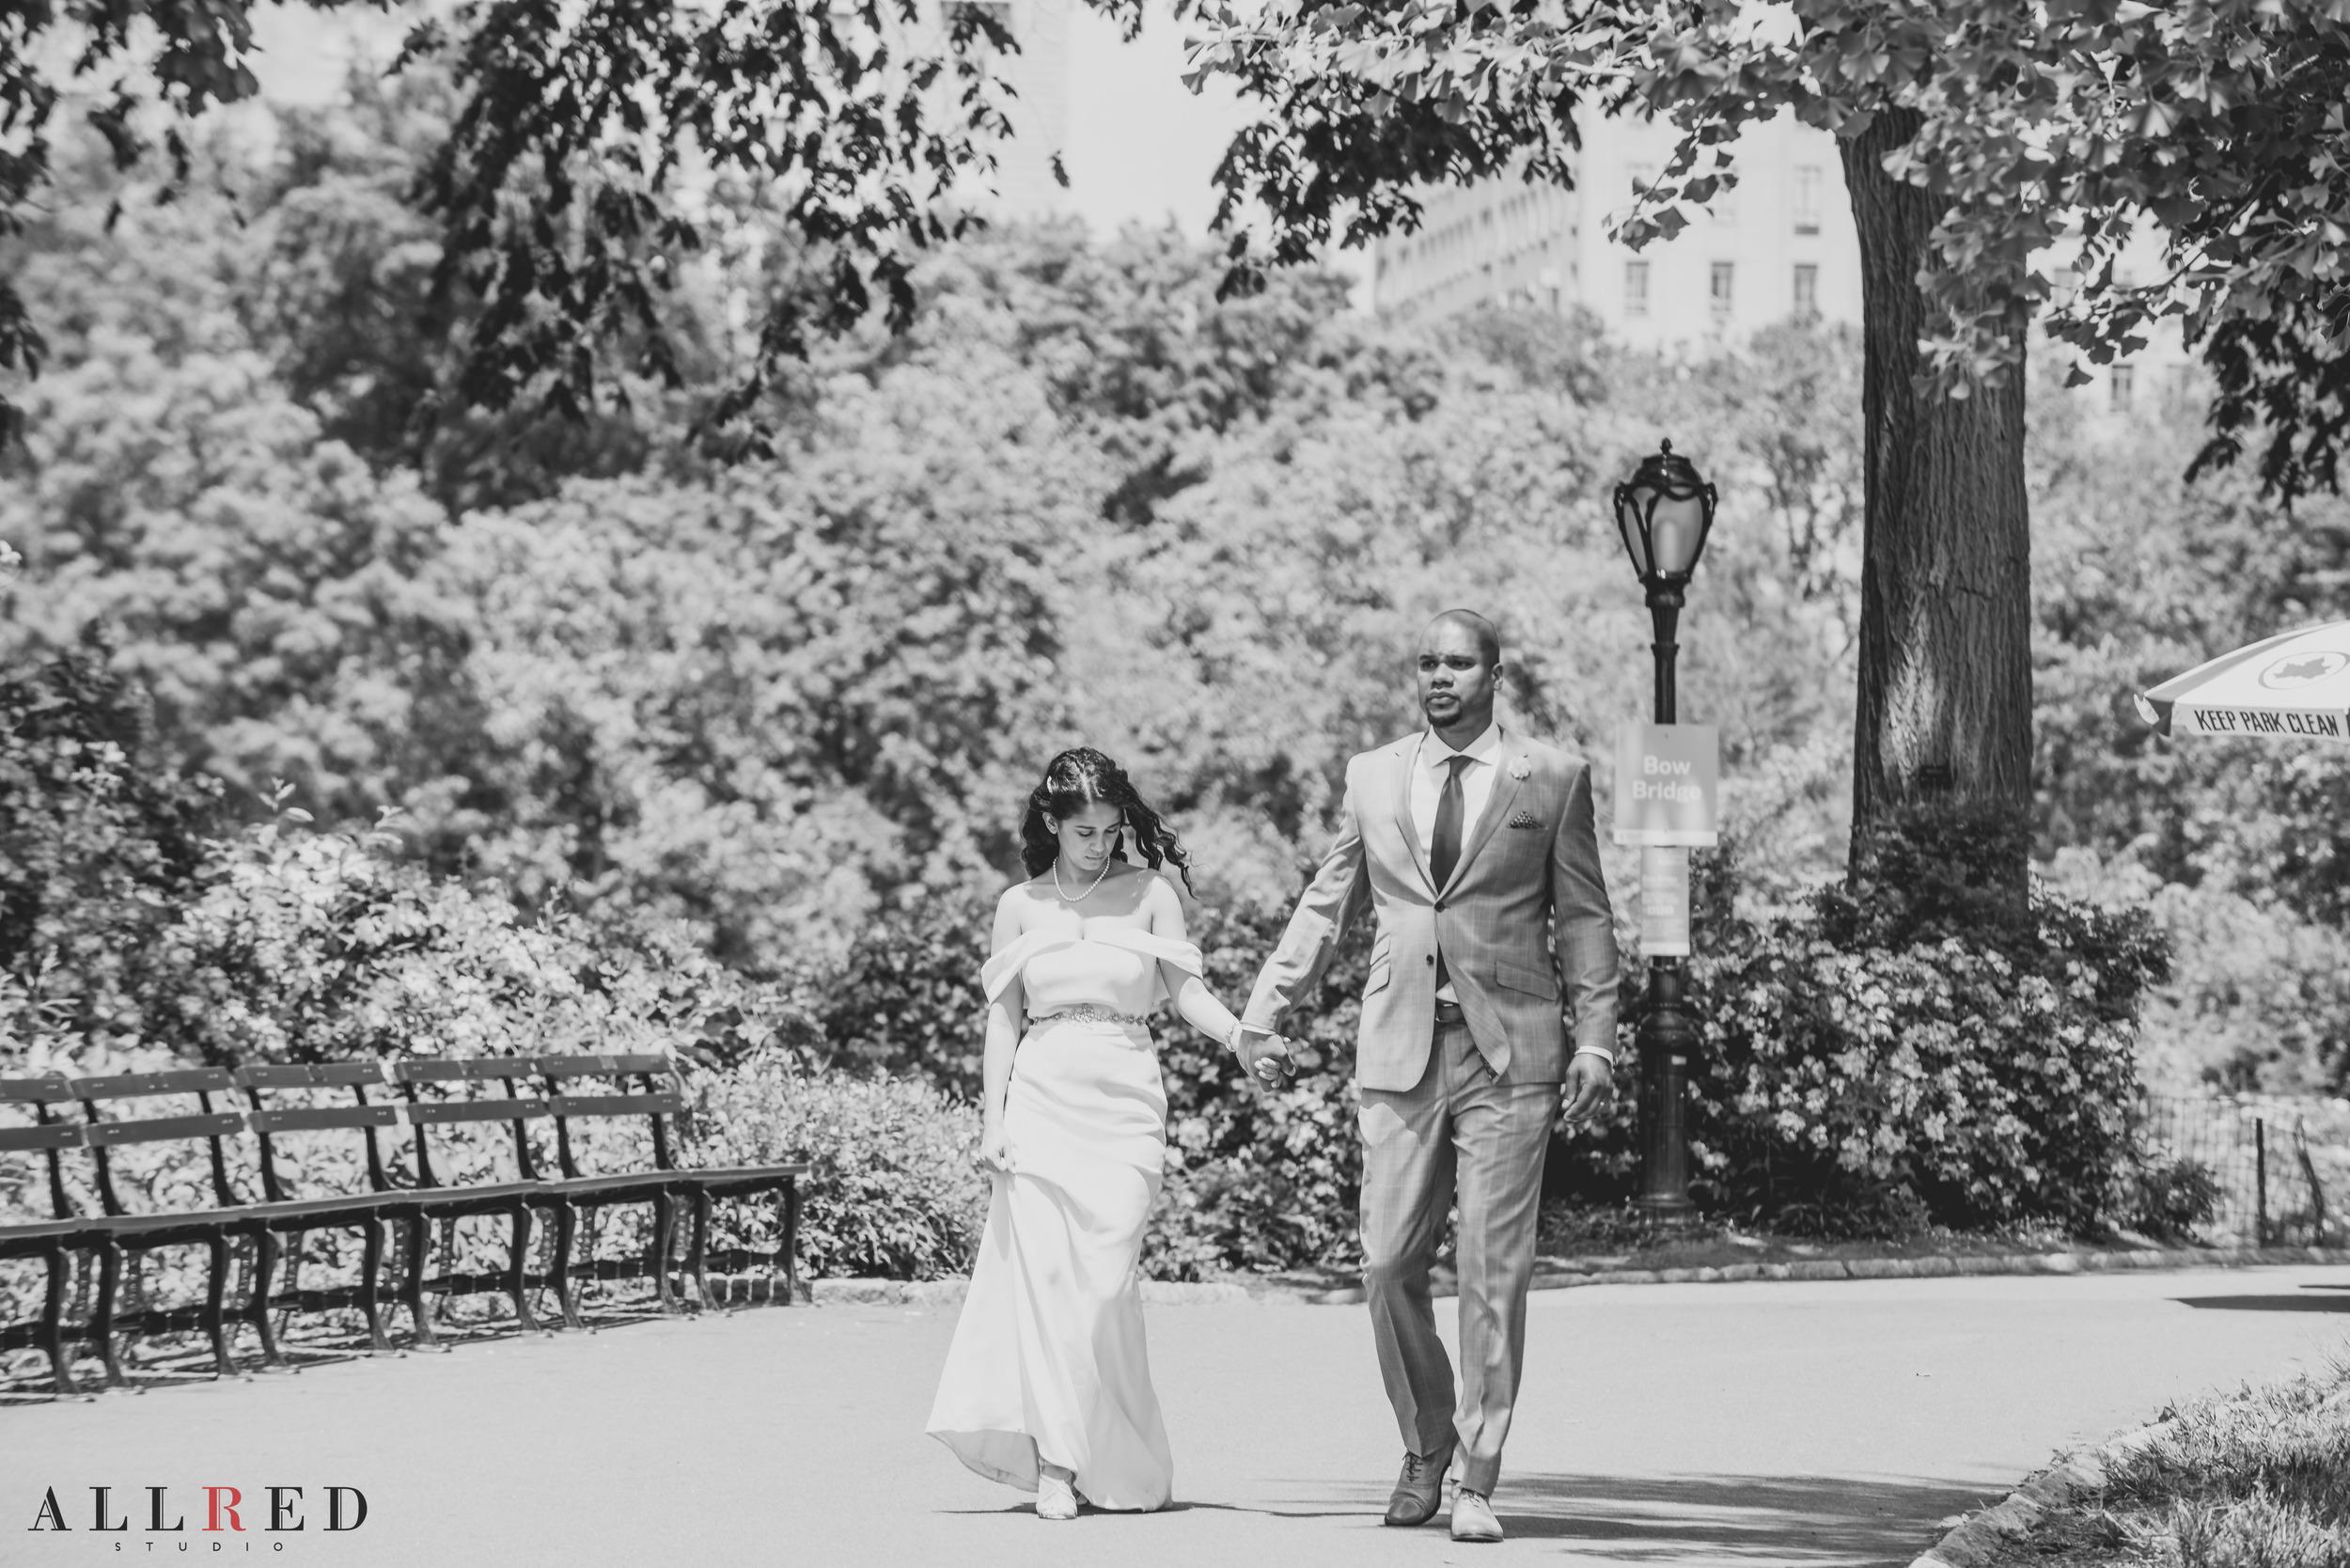 Wedding-central-park-allred-studio-new-york-photographer-new-jersey-hudson-valley-2487.jpg